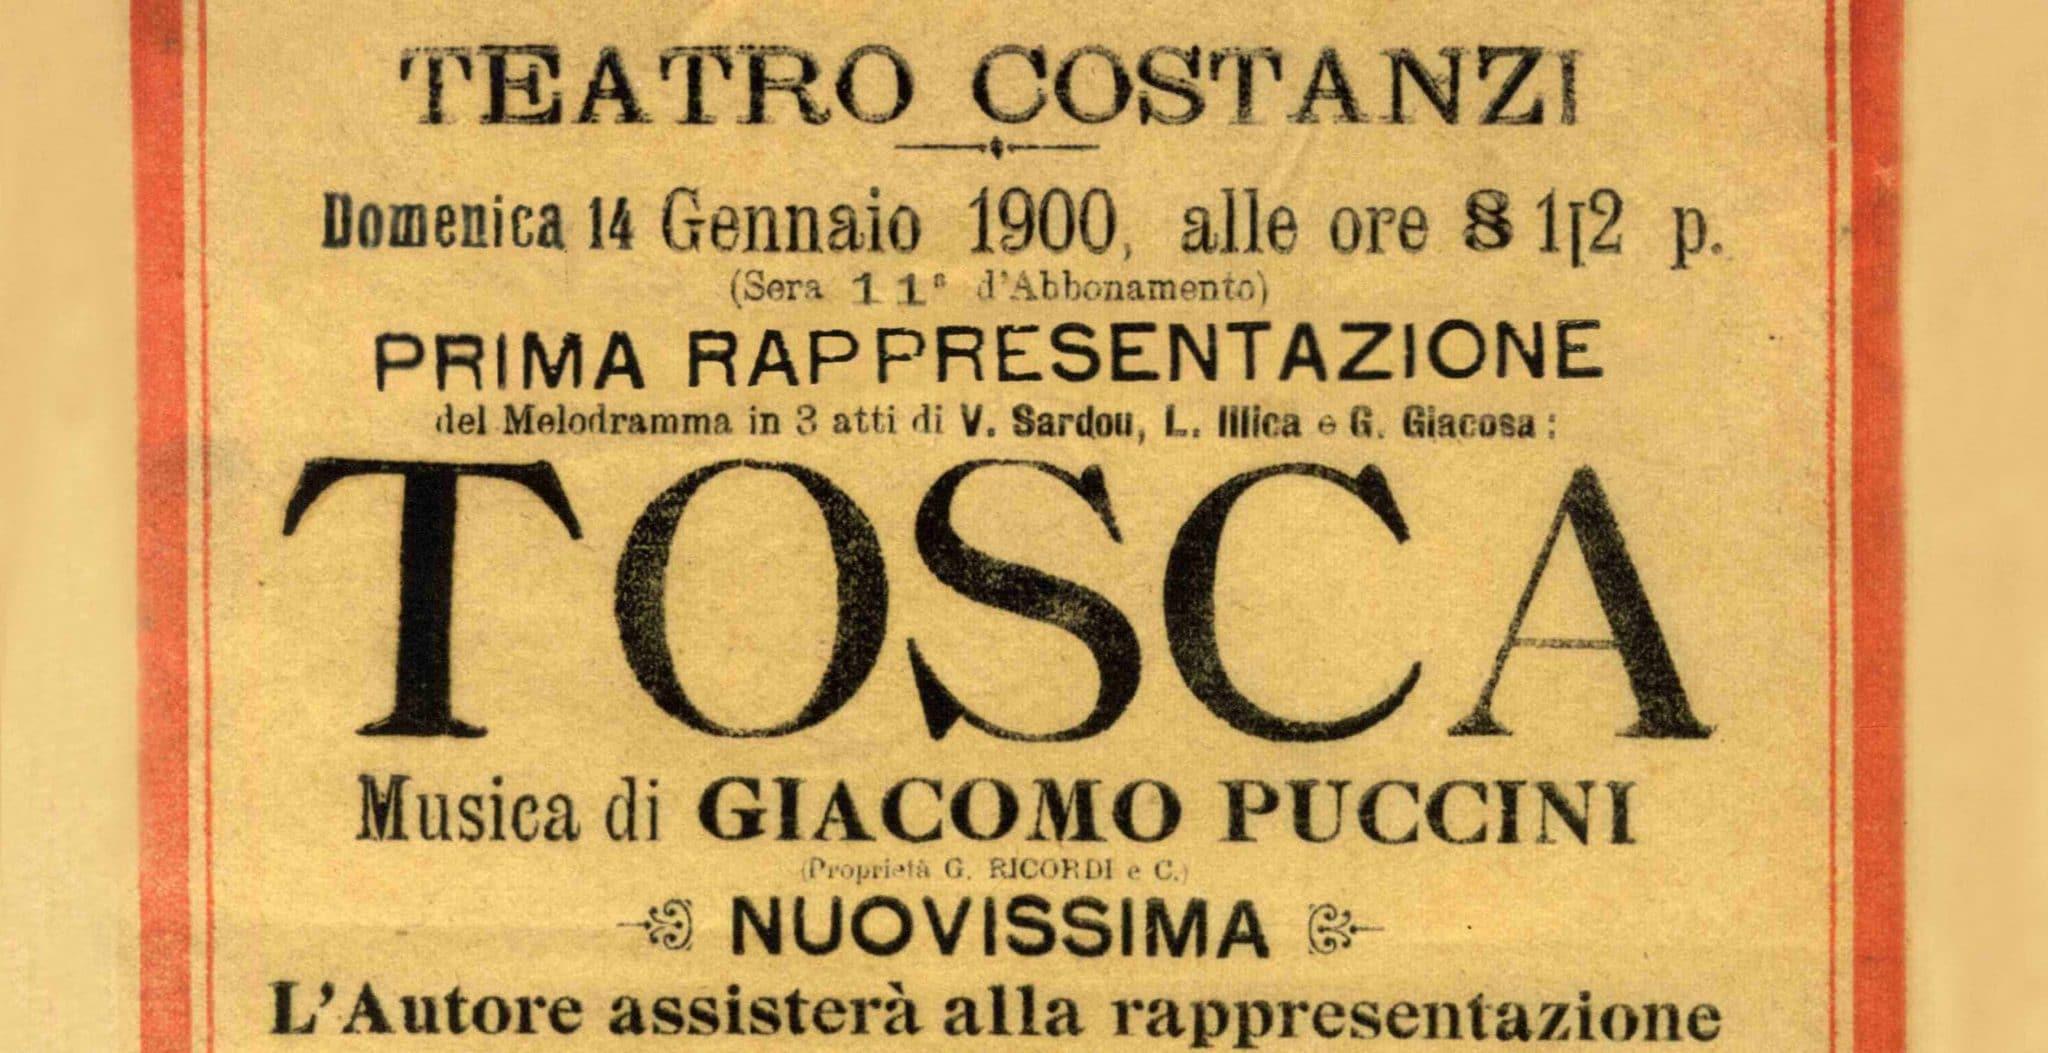 1899-00 Teatro Costanzi